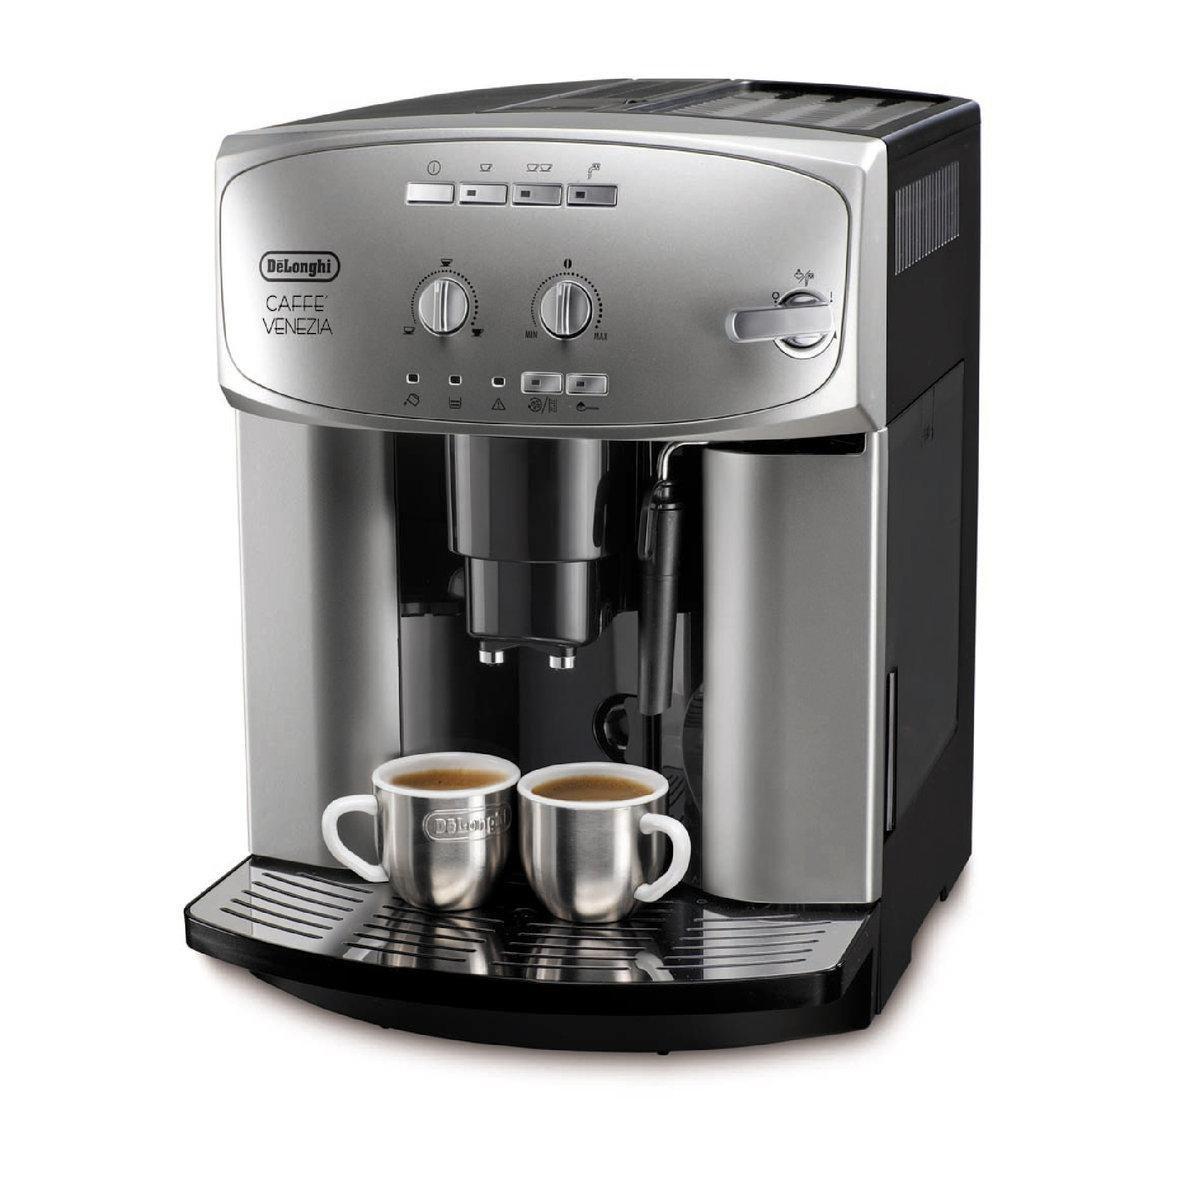 Machine caf delonghi esam 2200 s ex1 magnifica - Machine a cafe delonghi prix ...